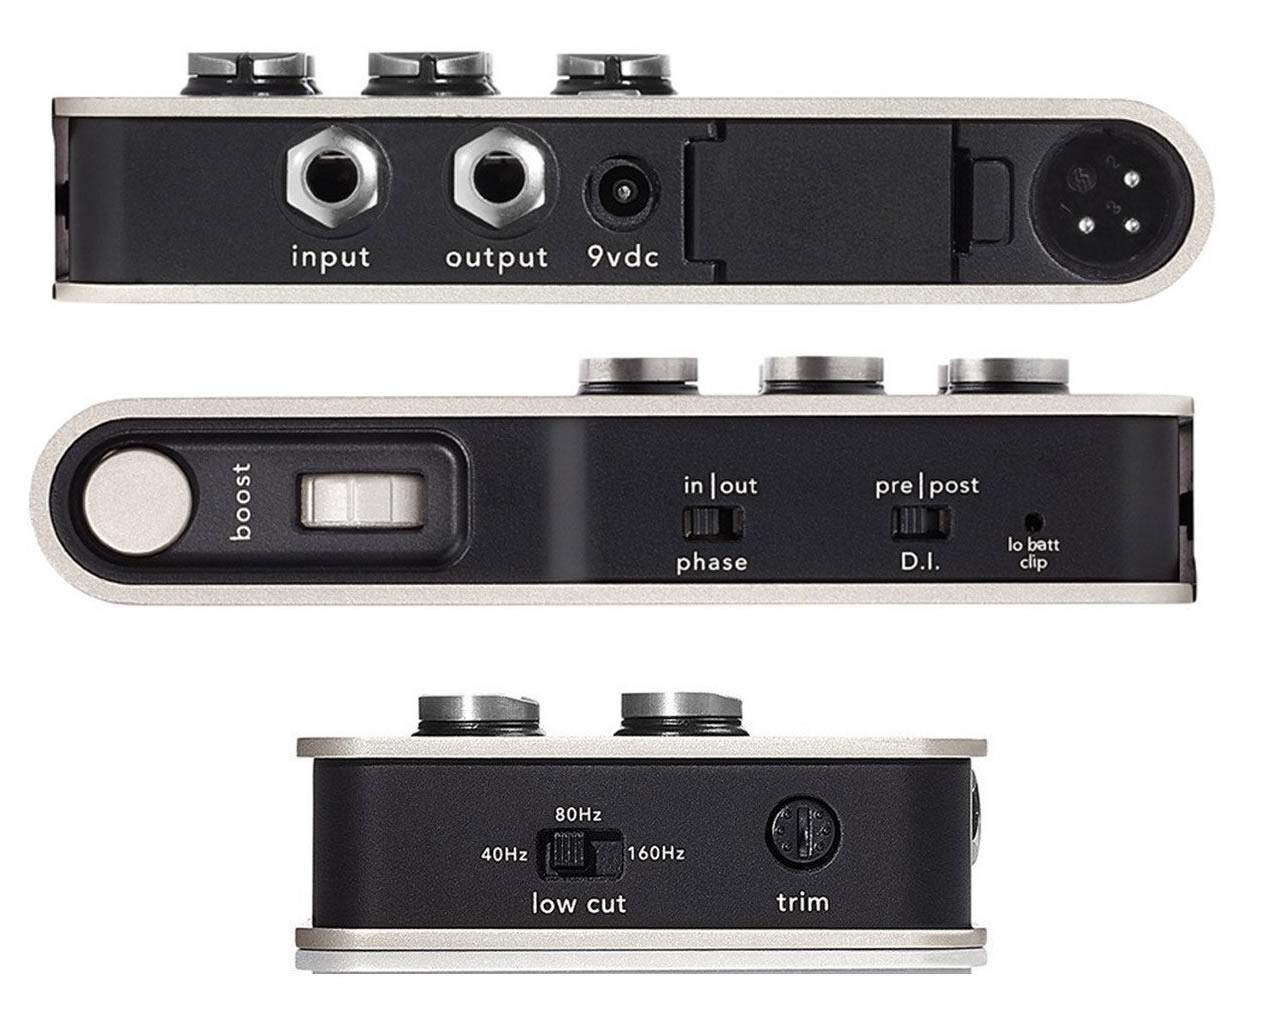 fishman platinum stage eq di analog preamp analog preamp pedal mydukkan. Black Bedroom Furniture Sets. Home Design Ideas